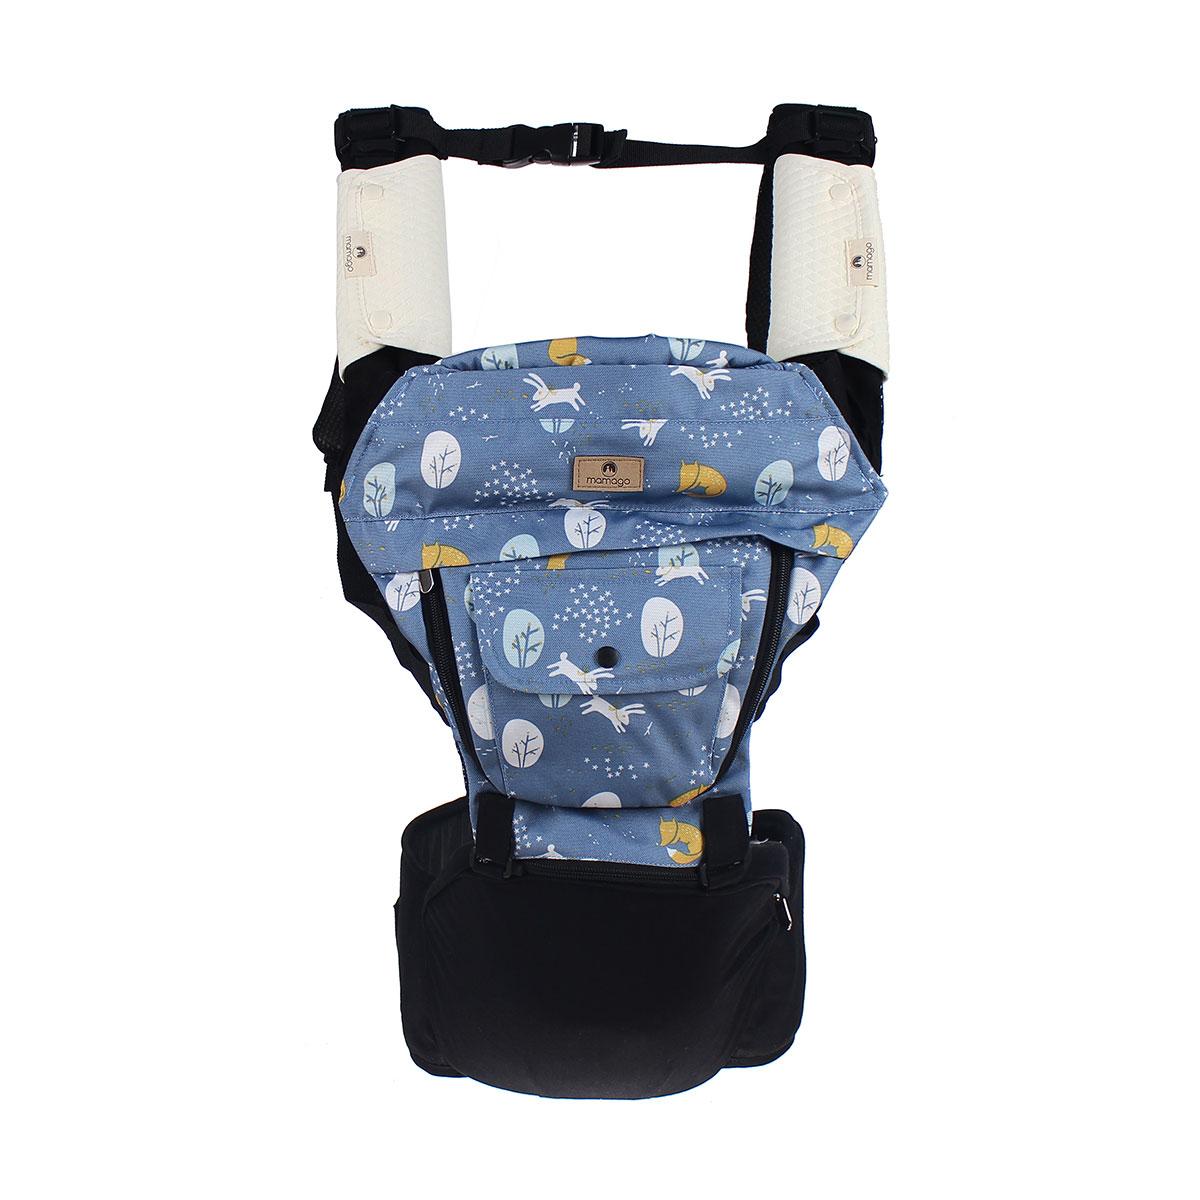 Địu ngồi cho bé Hip seat premium mamago C04